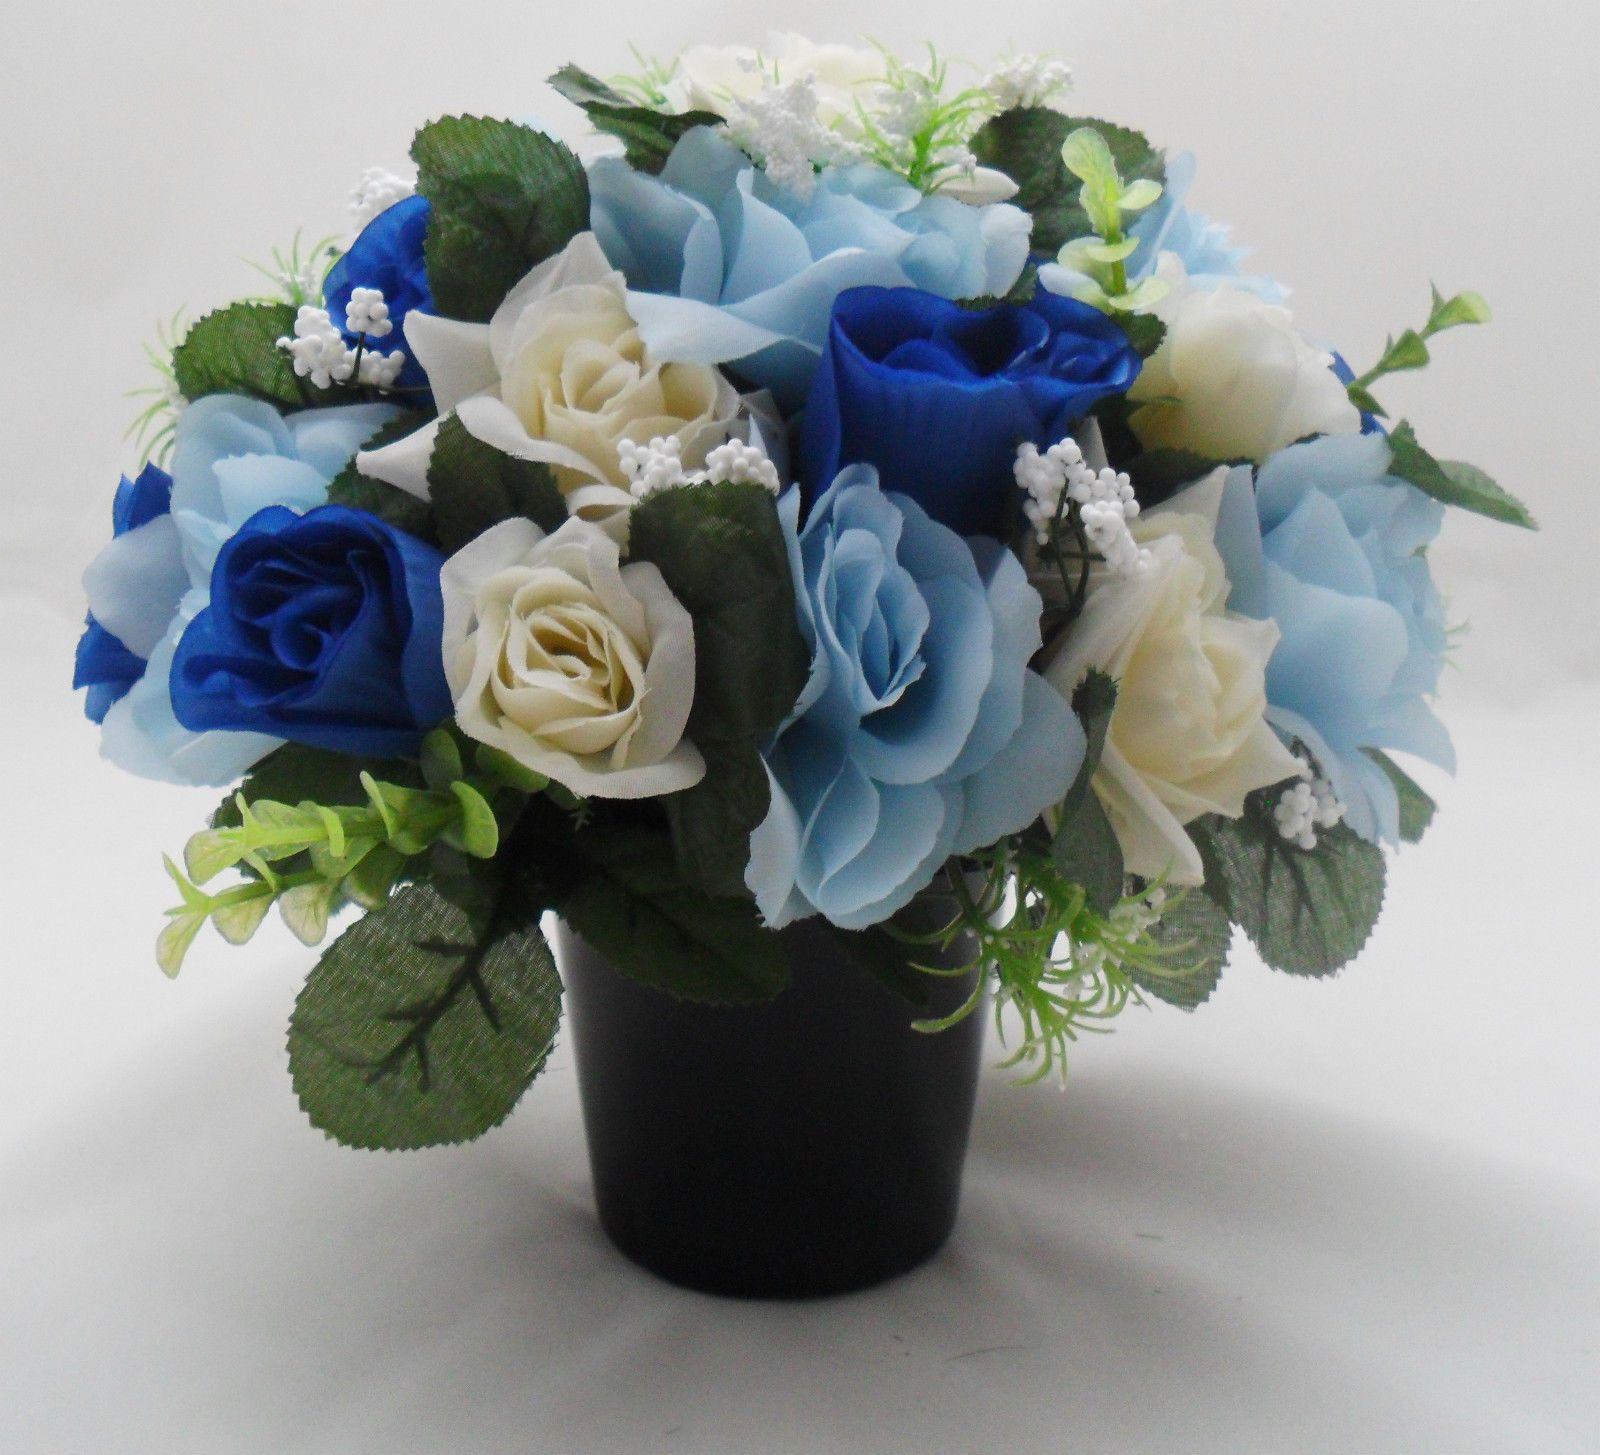 Personalised Message Memorial Vase Grave Flower Bowl Cemetery ...